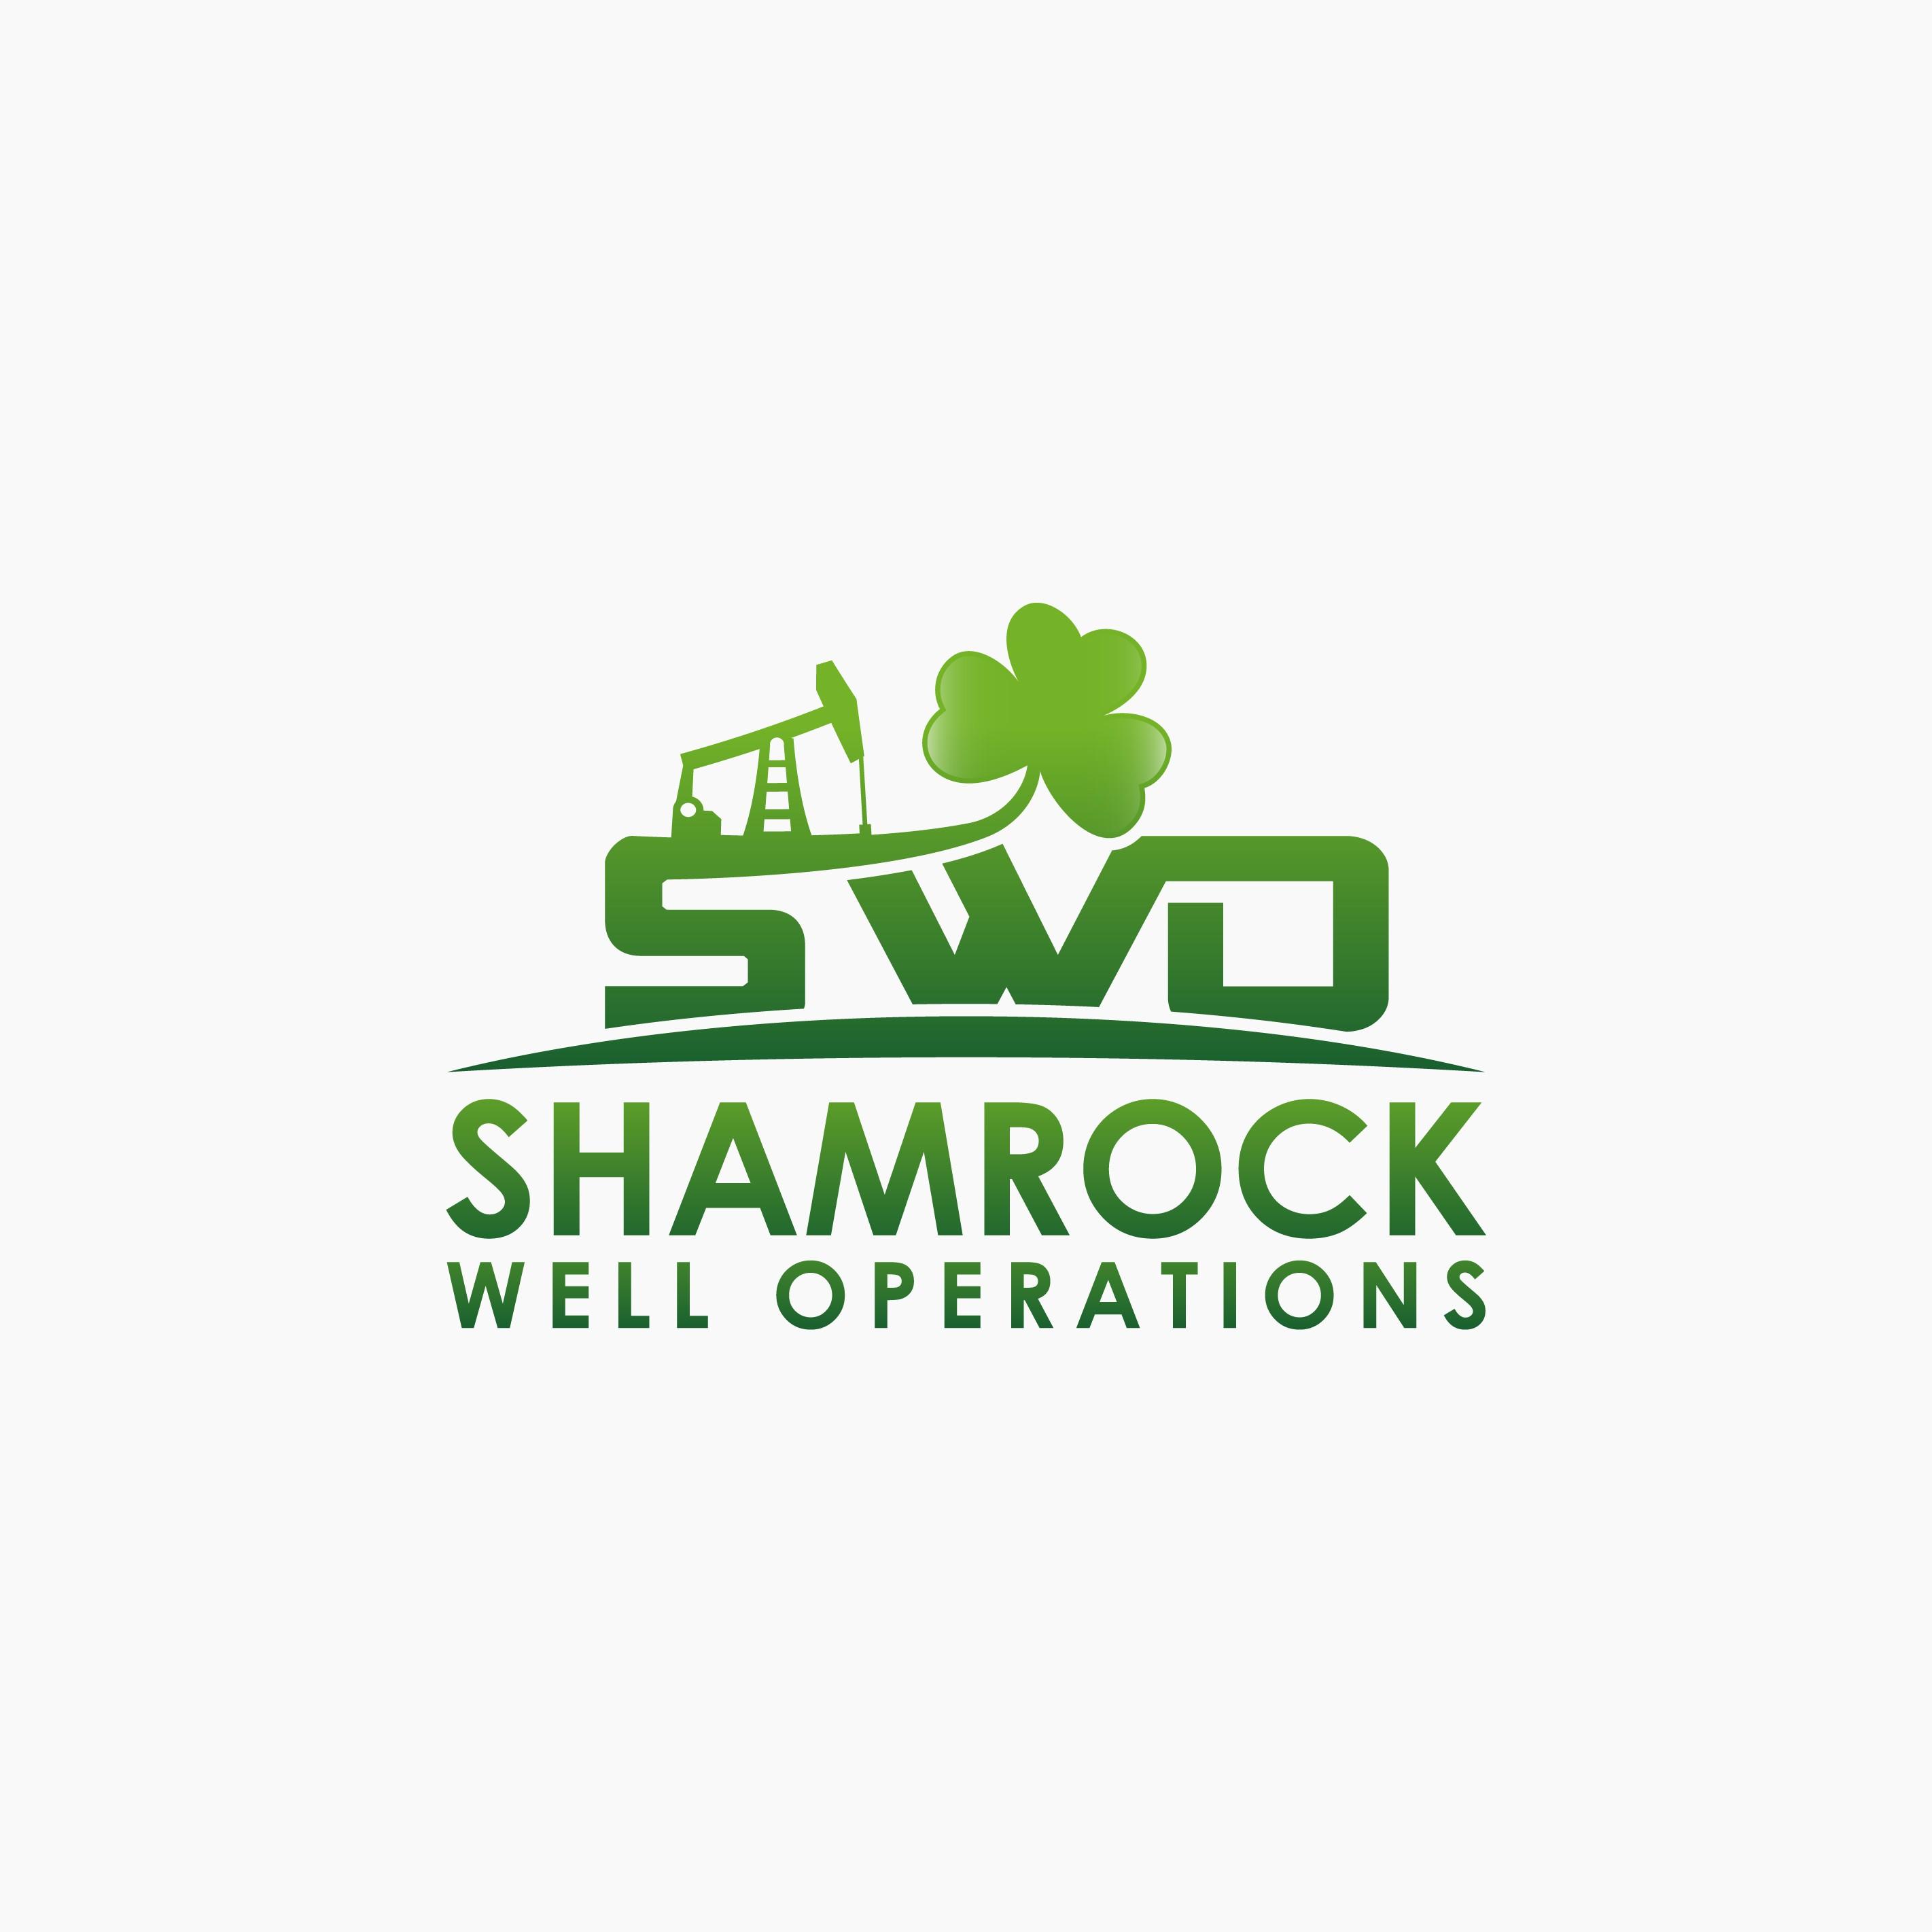 Shamrock Well Operations